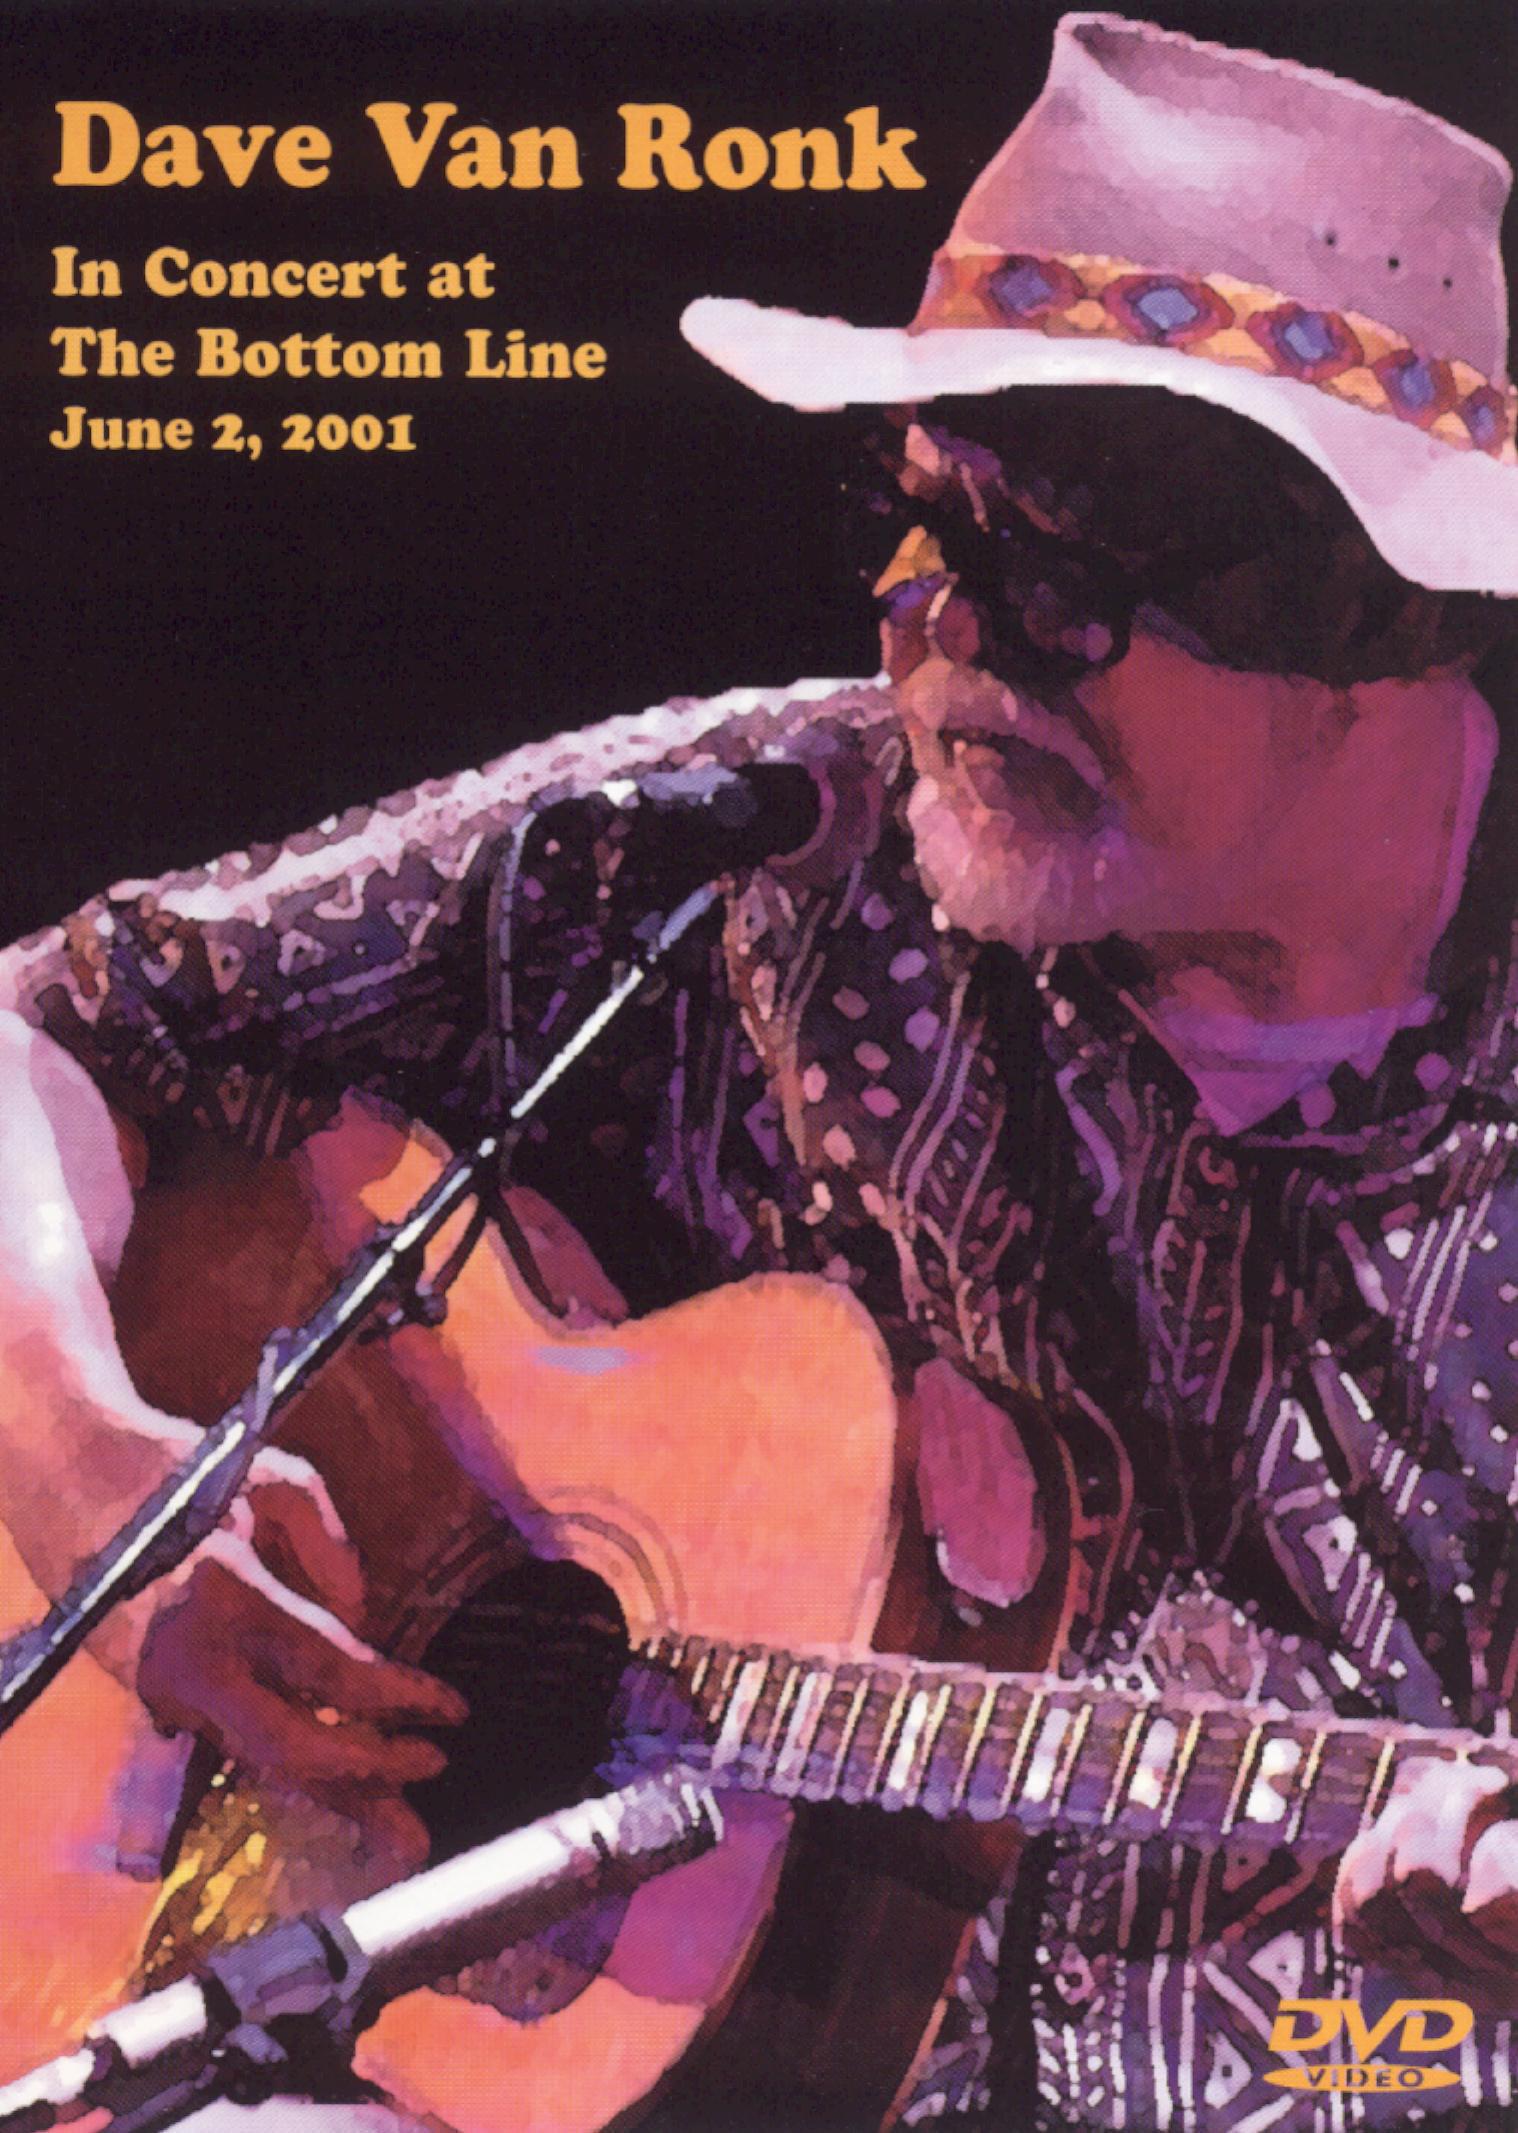 Dave Van Ronk: In Concert at The Bottom Line - June 2, 2001